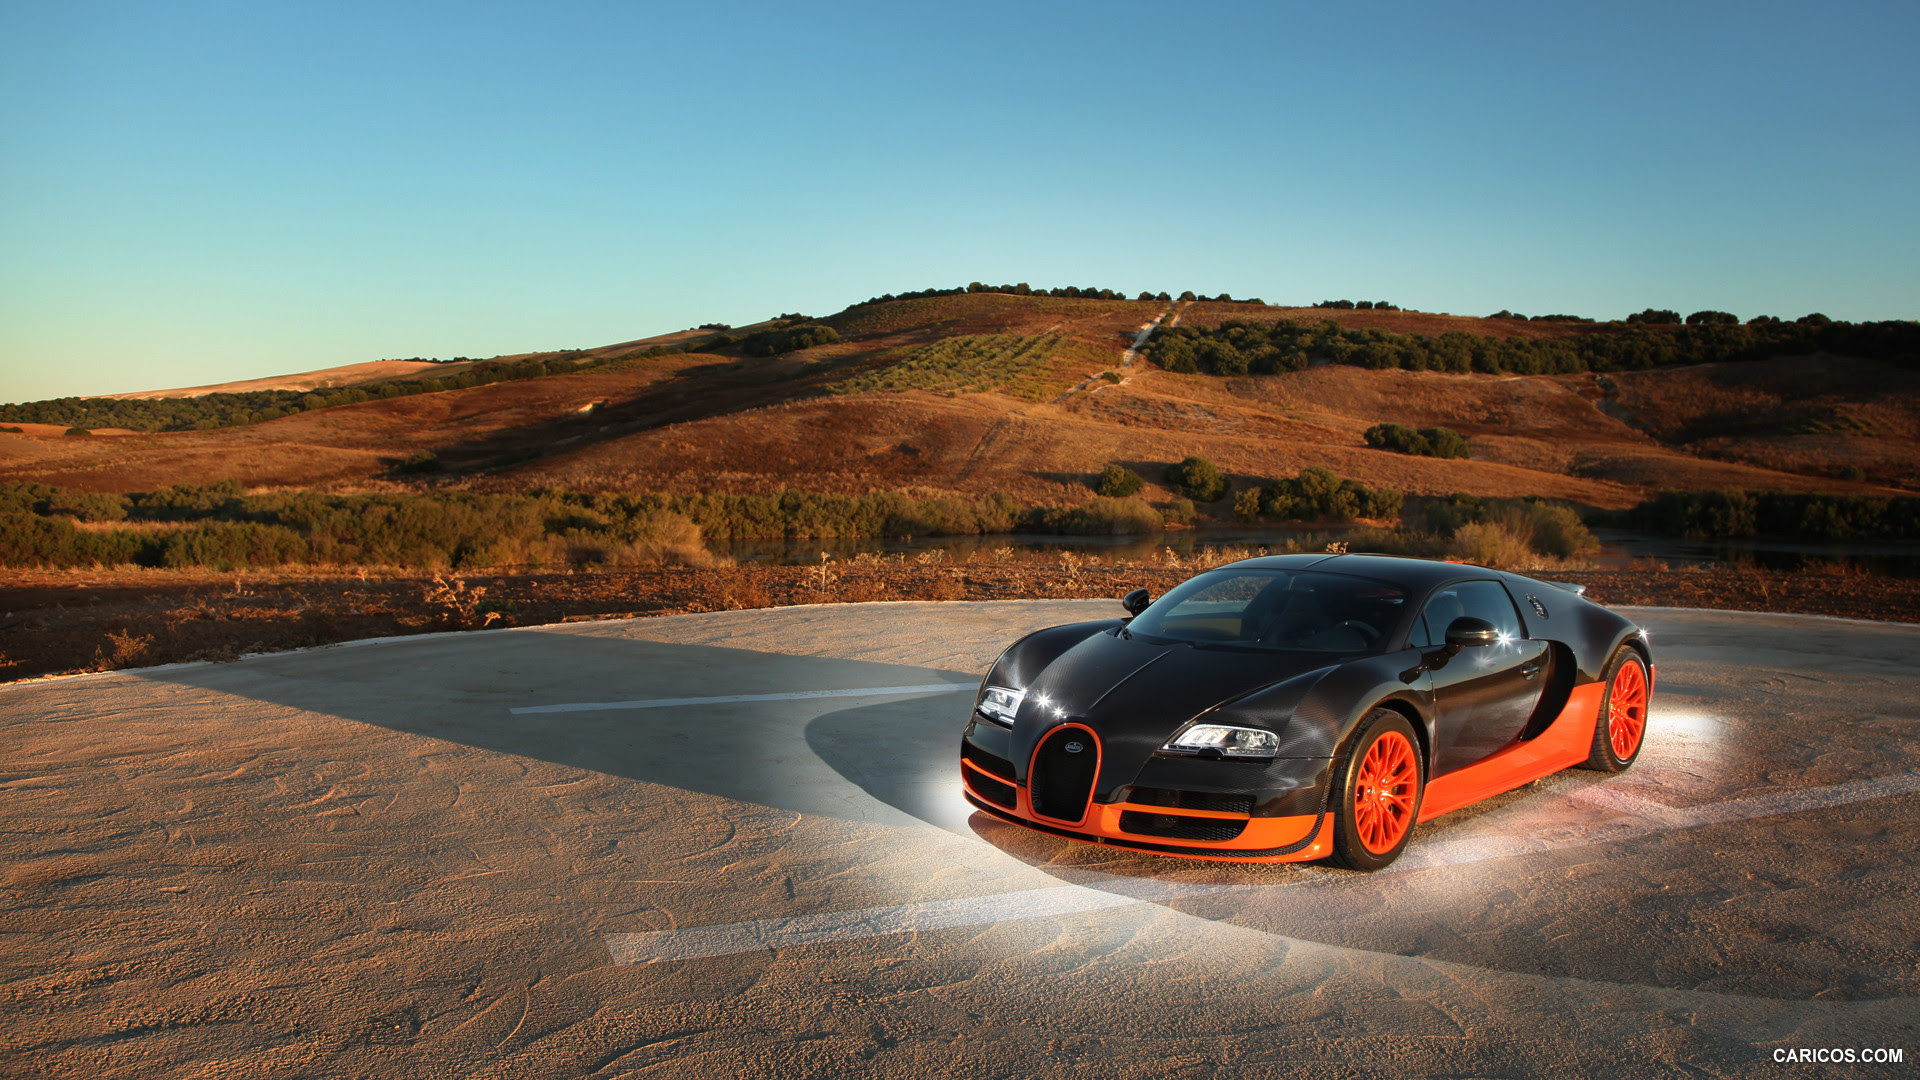 Bugatti Veyron Super Sport  Orange \u0026 Black  HD Wallpaper 56